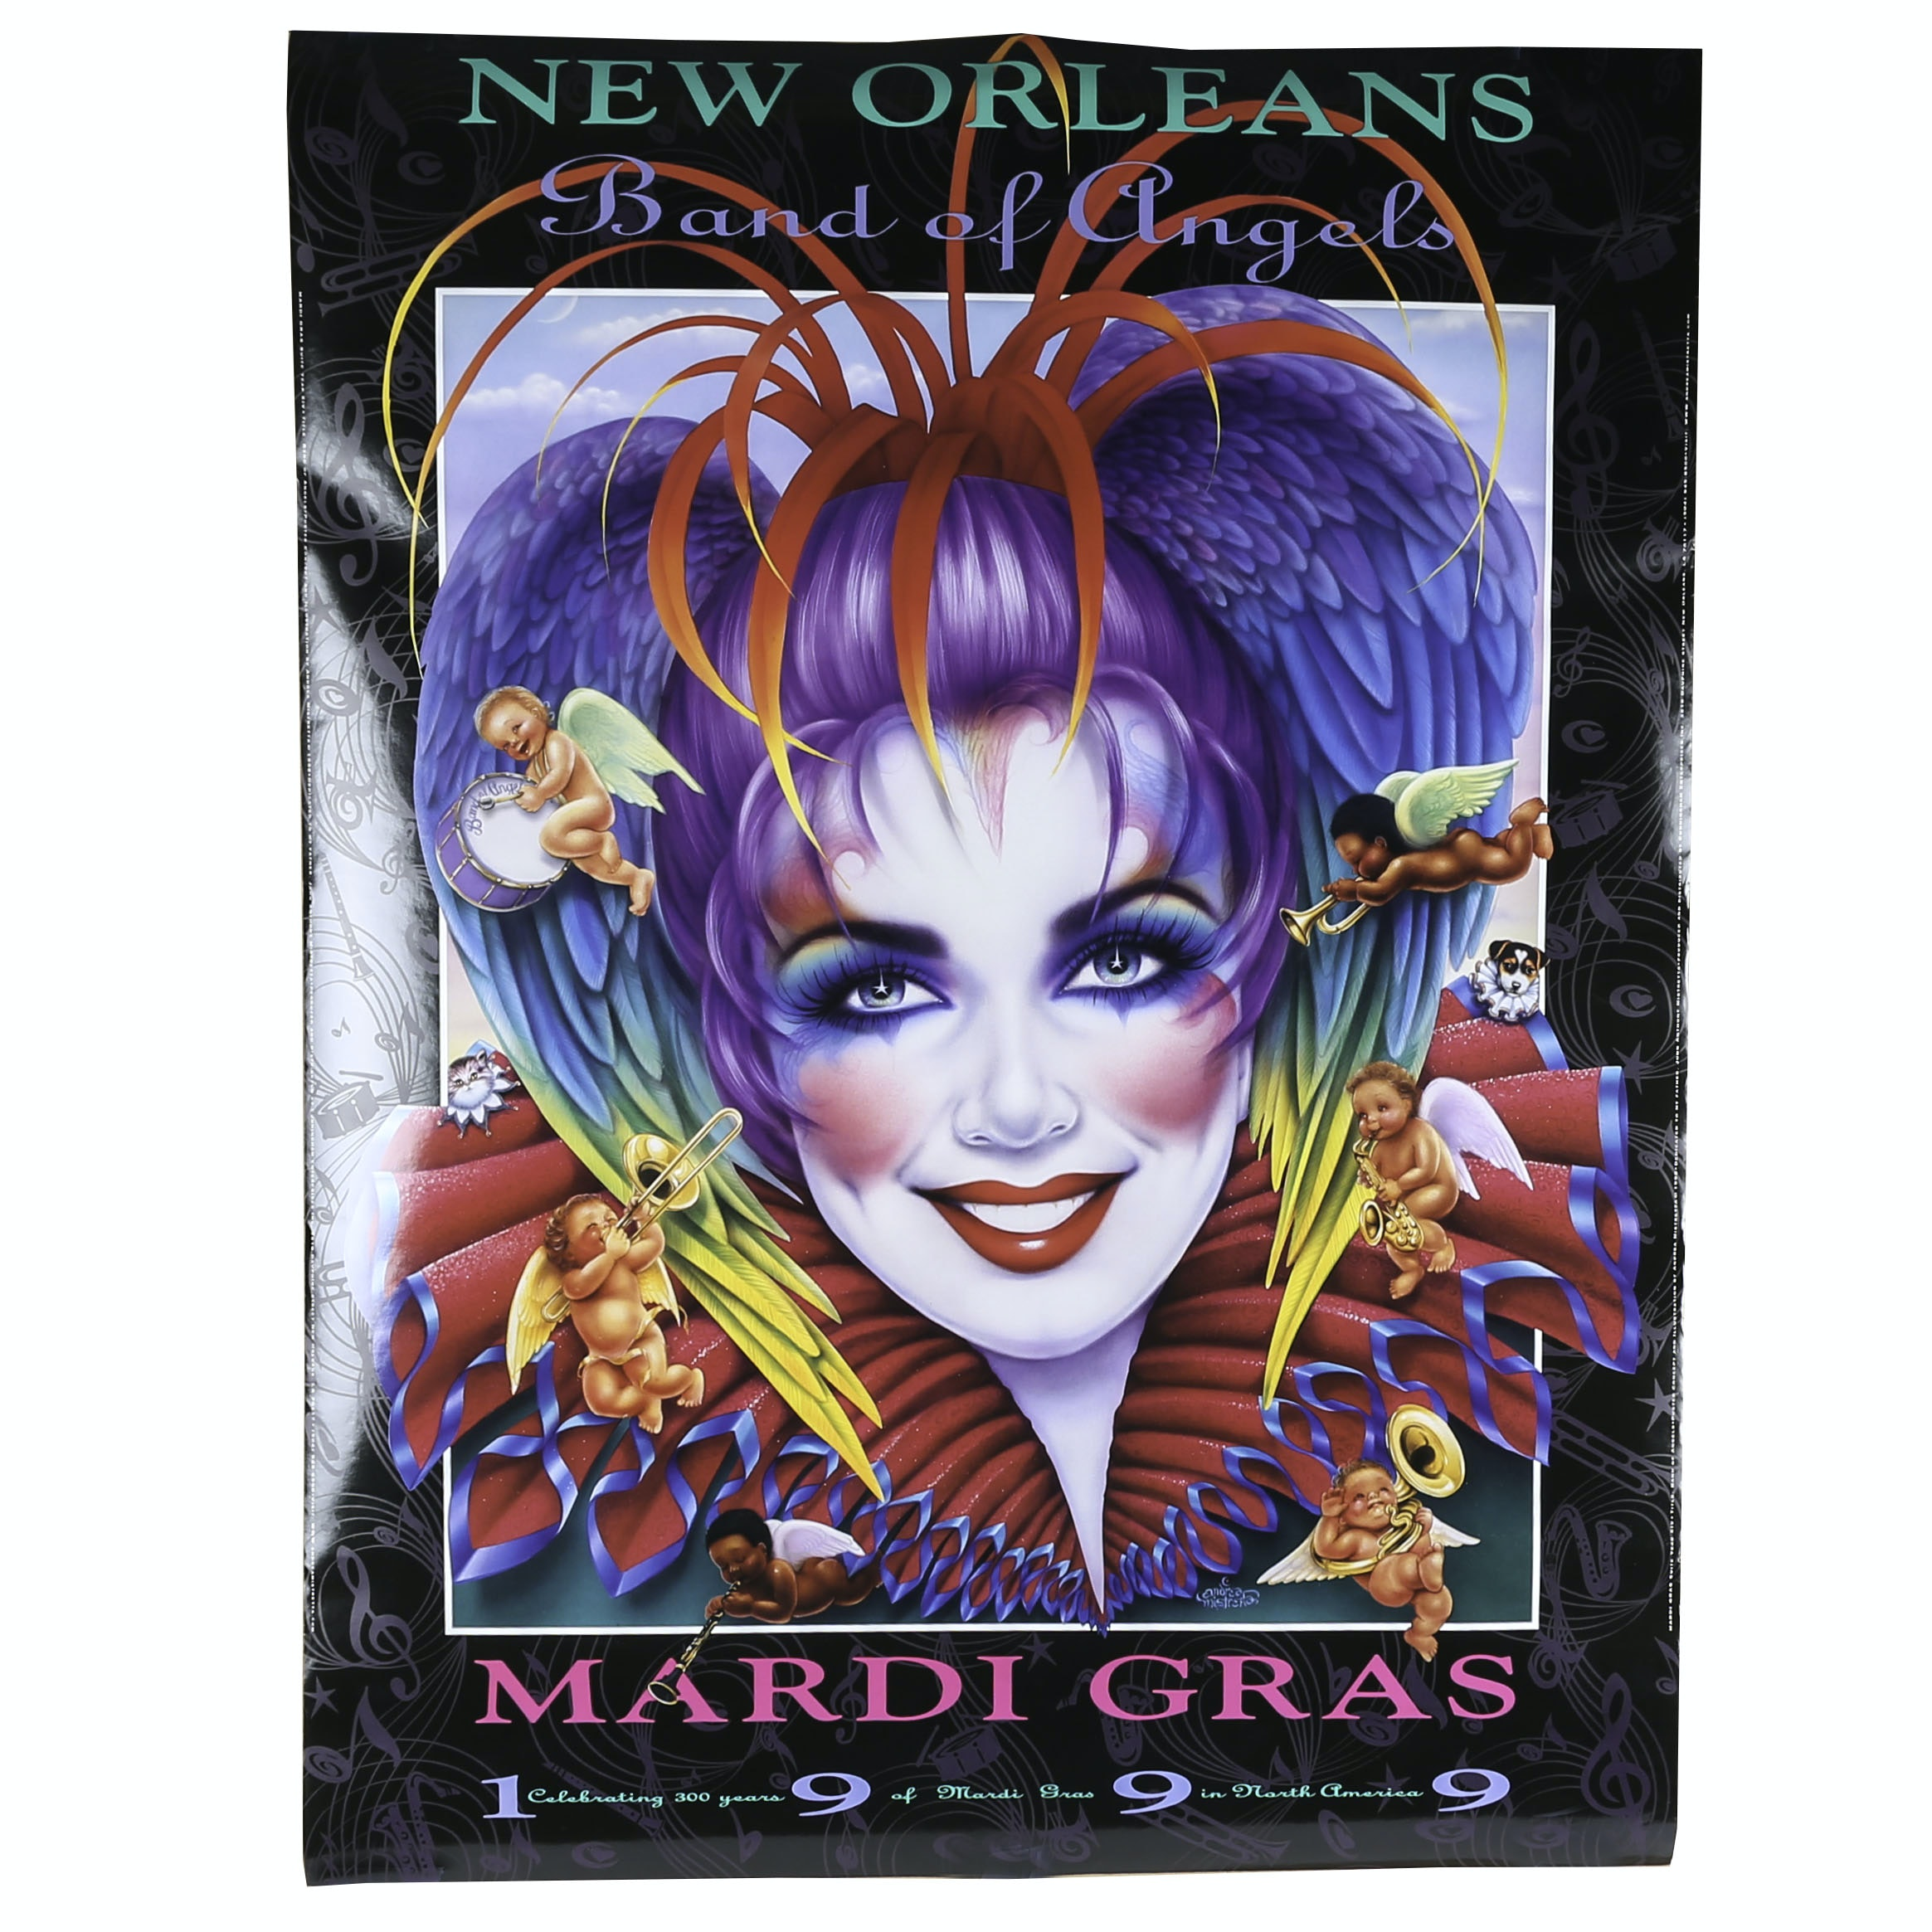 Offset Lithograph 1999 Mardi Gras Poster after Andrea Mistretta